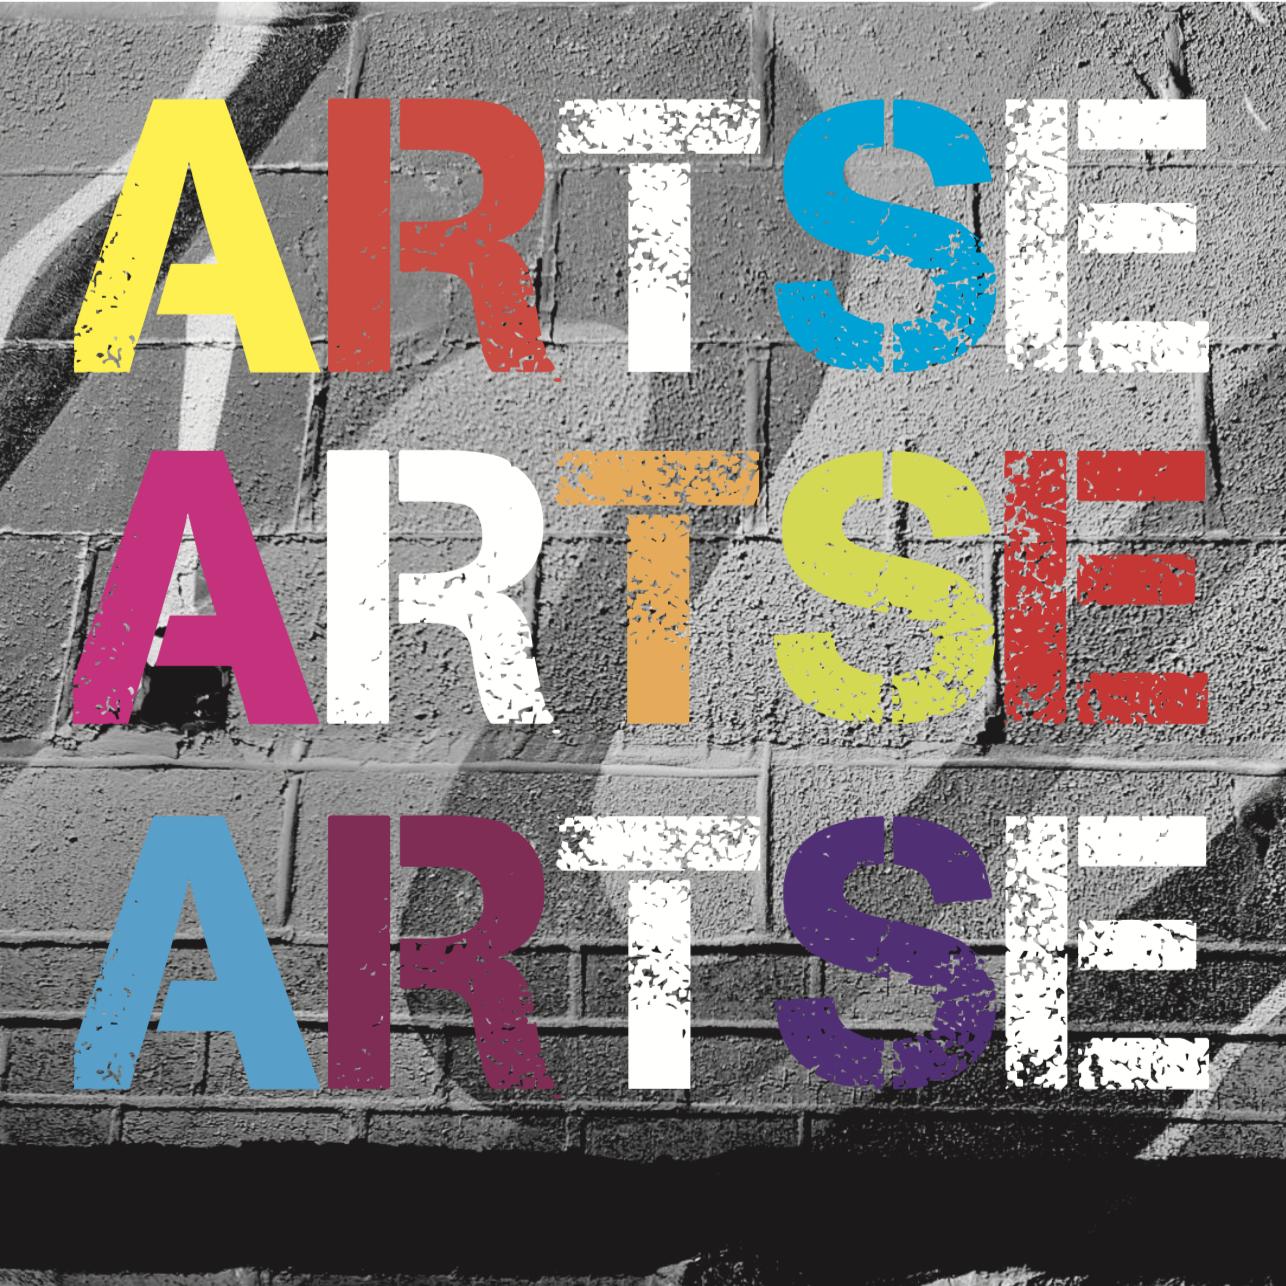 ARTSE_Square.png